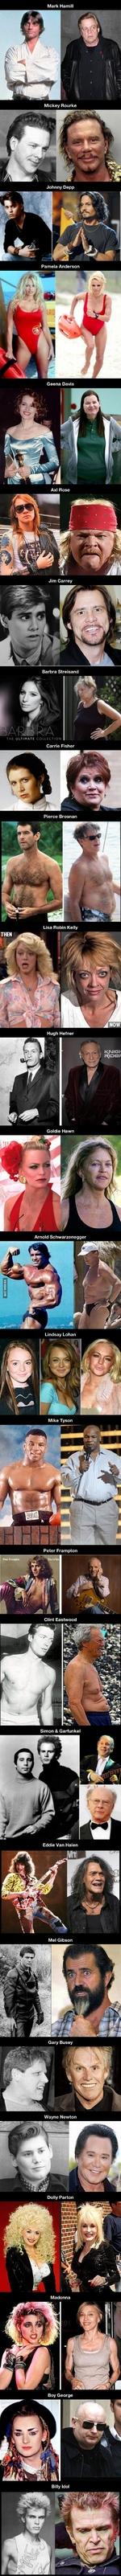 Geena DavisArnold SchwarzeneggerMike Tyson(riIV.IIVutr4-J./4.n/% J4) II' u